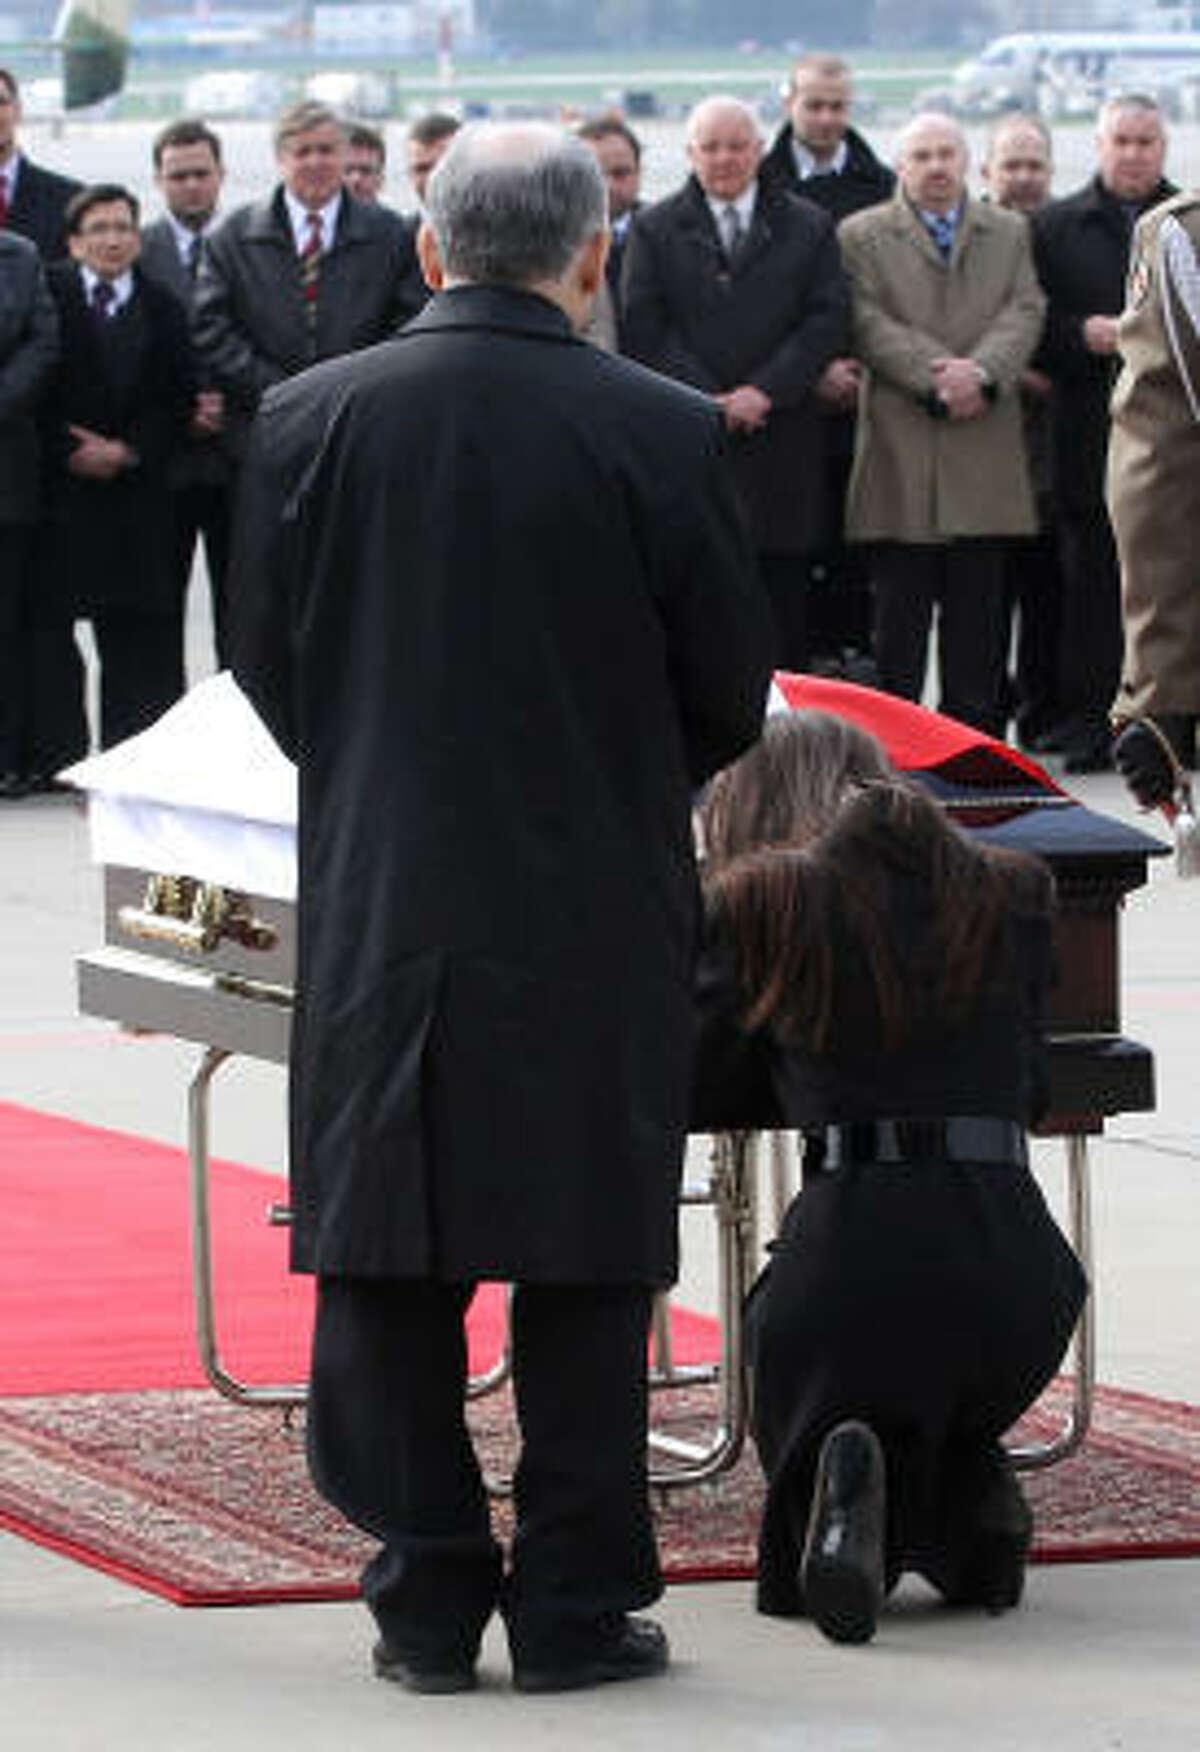 Jaroslaw Kaczynski, twin brother of late Polish President and daughter Marta Kaczynska pray by the coffin of president Lech Kaczynski after its arrival in Warsaw.